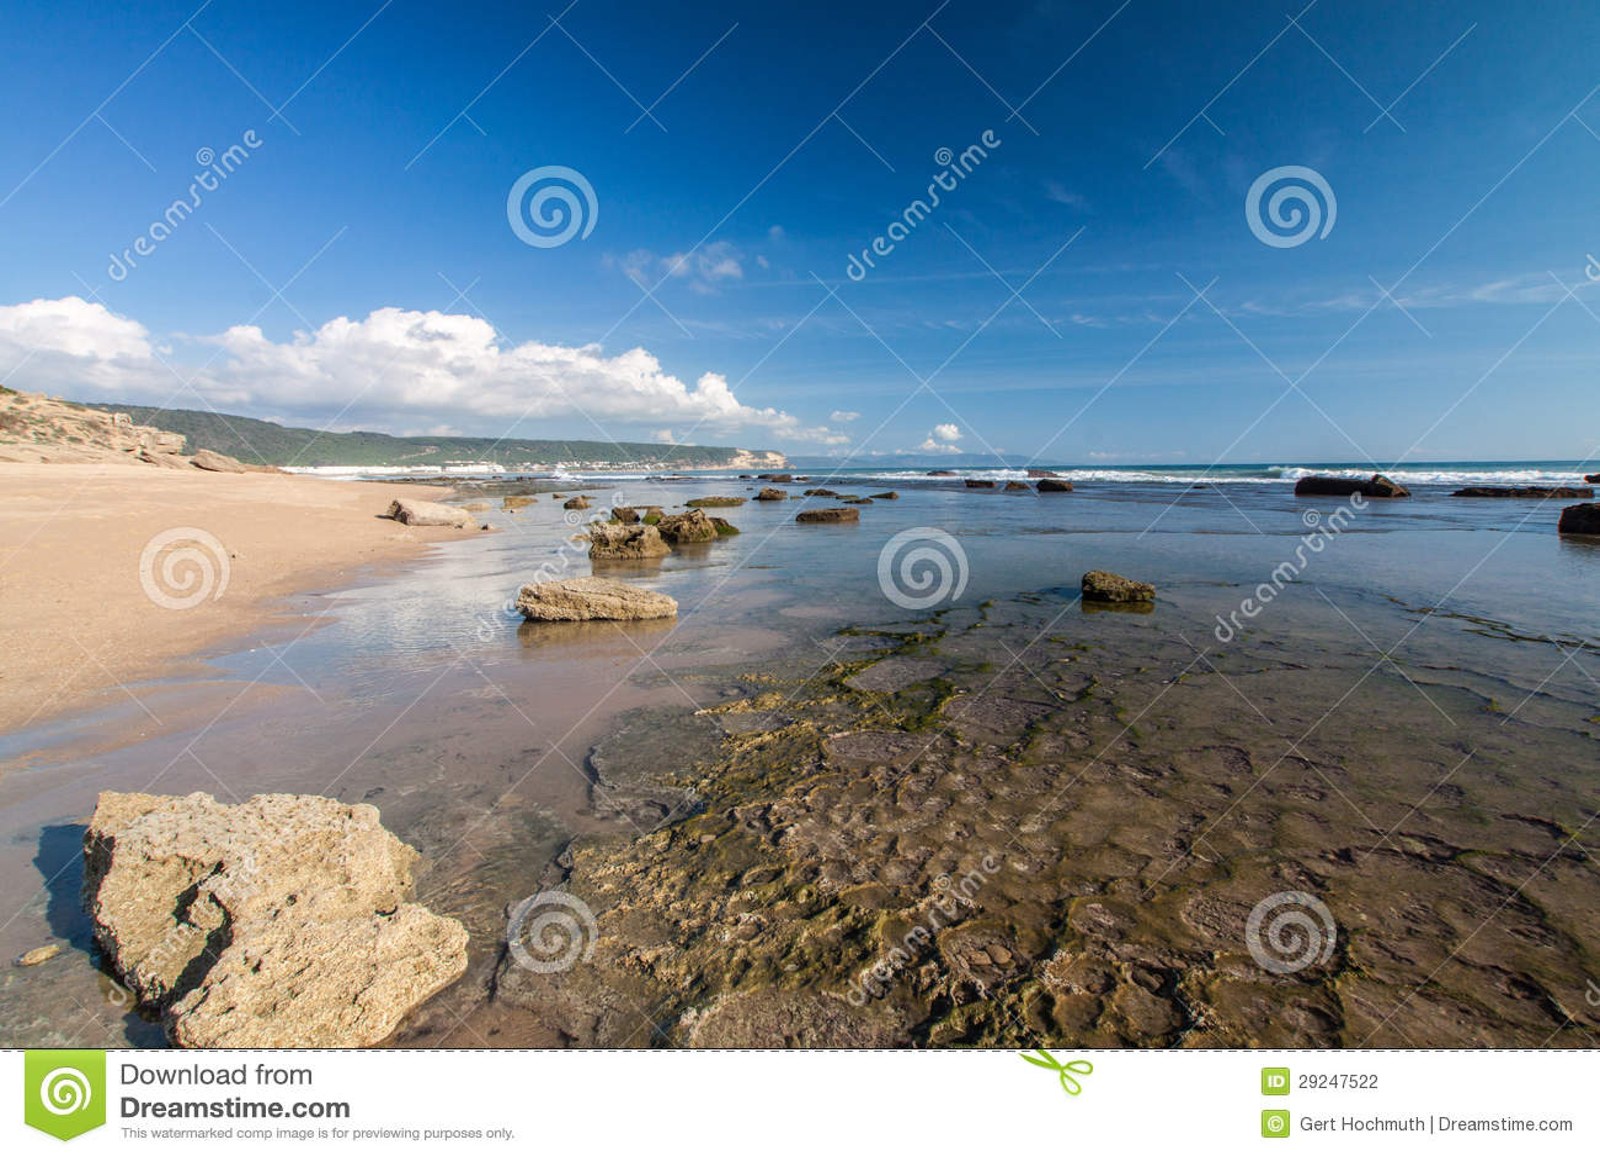 Download Cabo de Trafalgar foto de stock. Imagem de ensolarado - 29247522